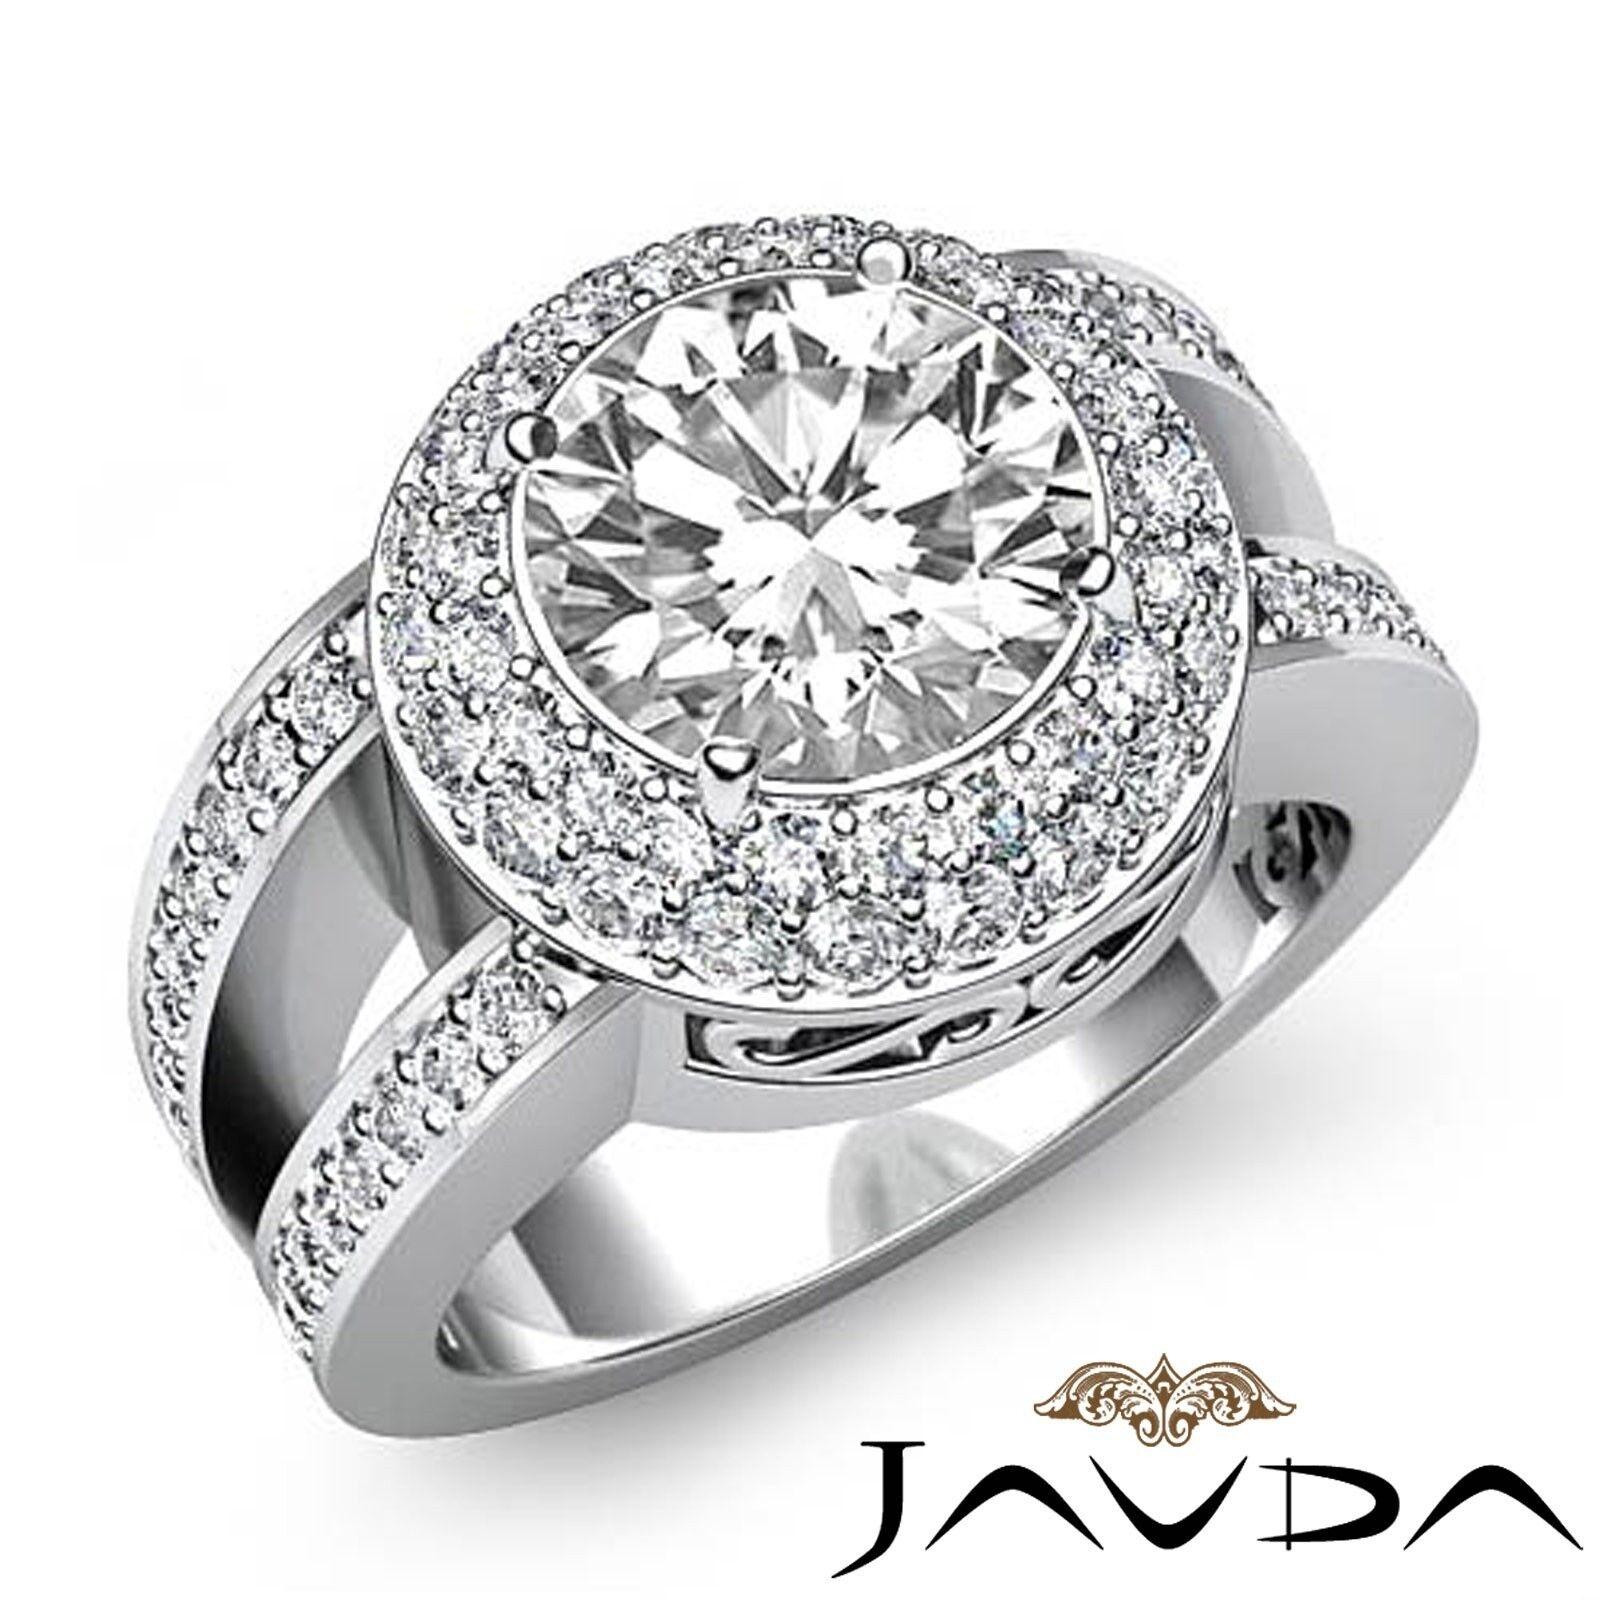 3.64ct Vintage Duet Halo Pave Round Diamond Engagement Ring GIA G-SI1 White Gold